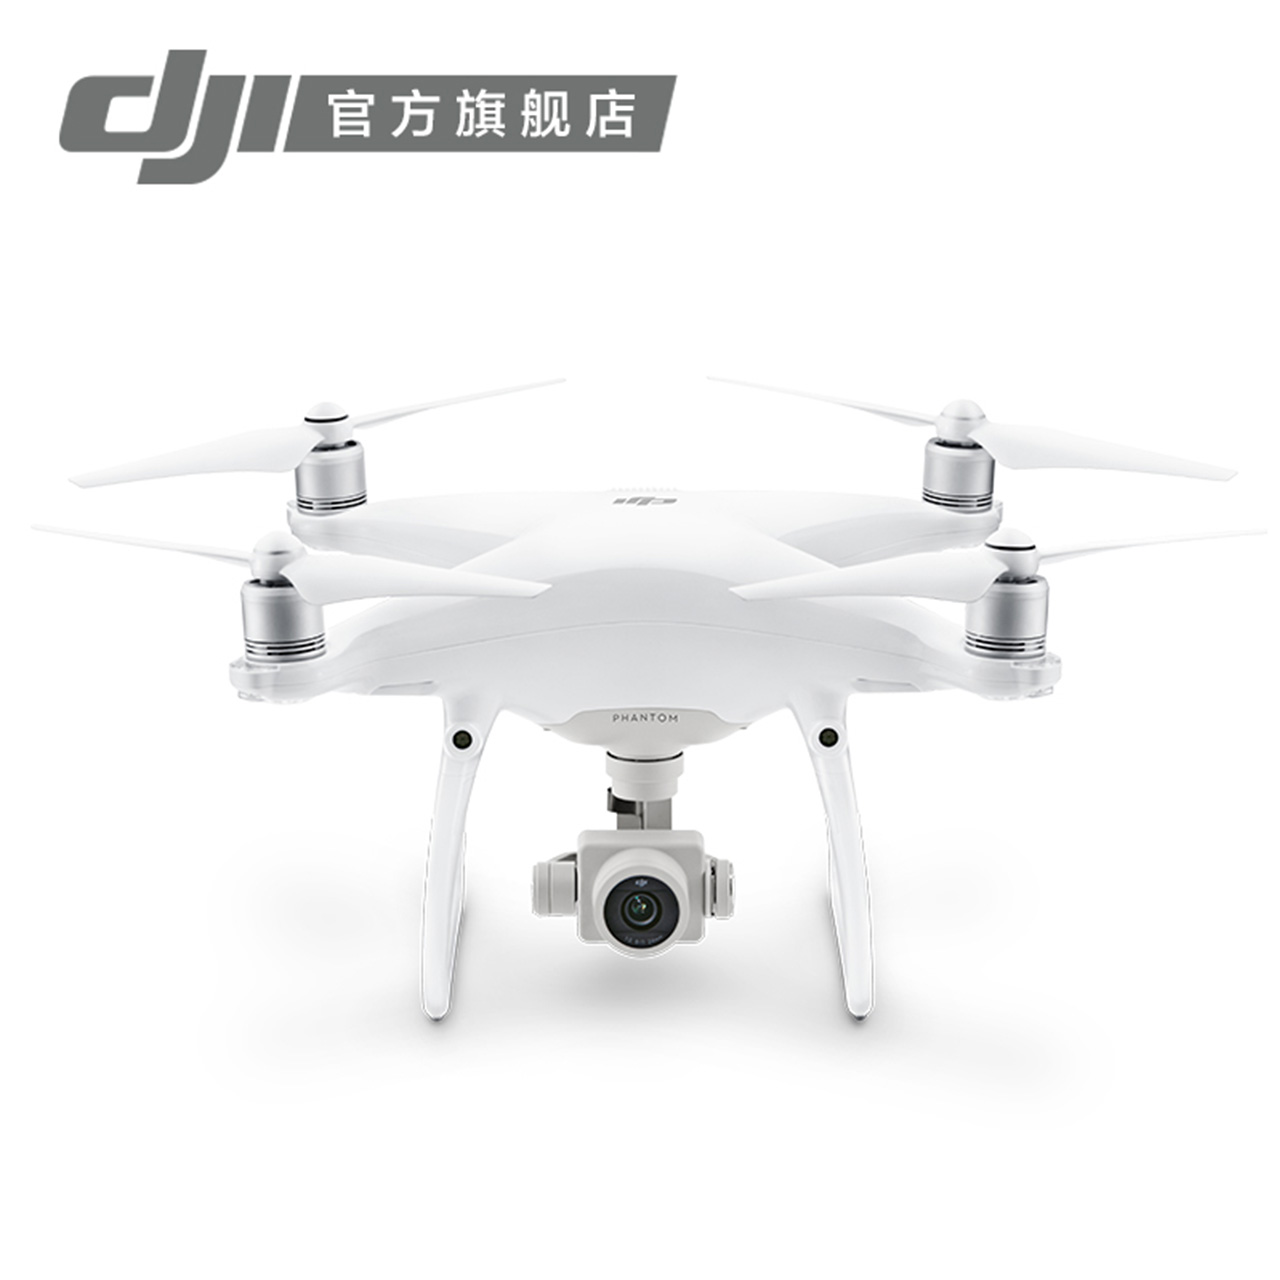 DJI大疆精灵 Phantom 4 Advanced 航拍无人机双电套装 持久续航